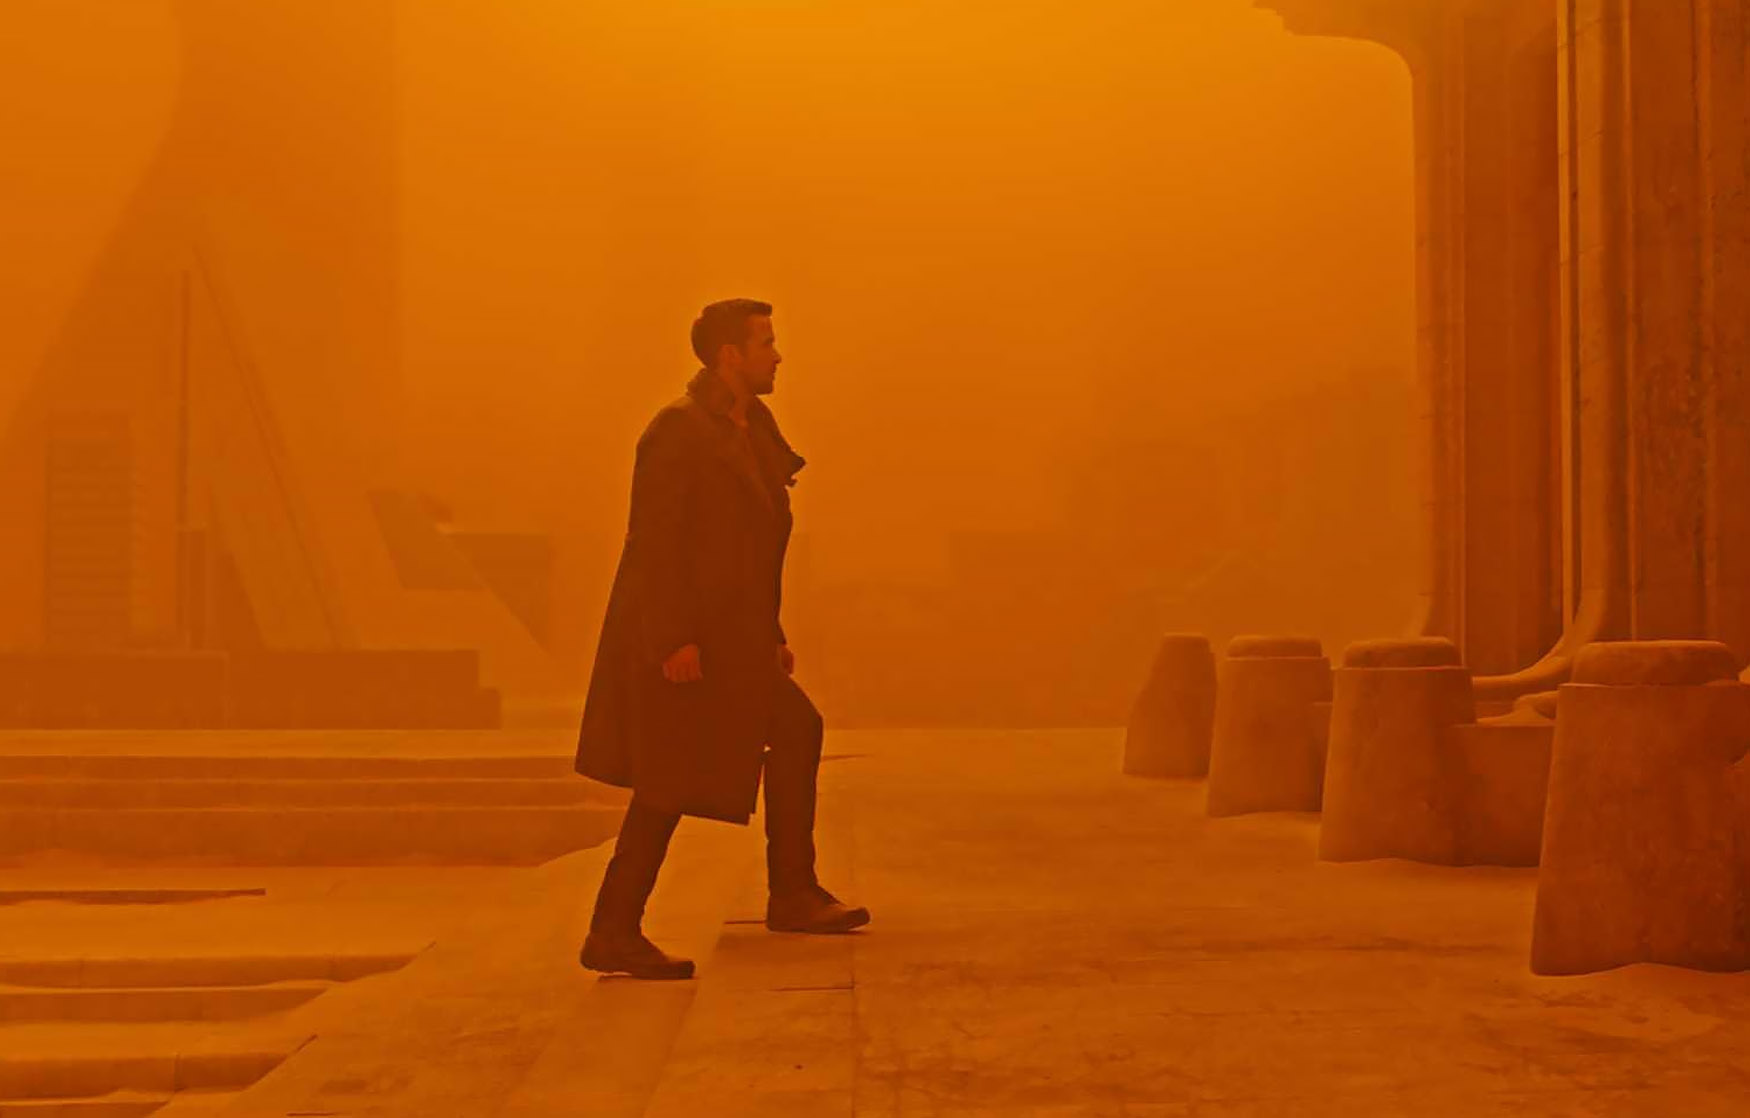 San Francisco basically looks like the apocalypse right now